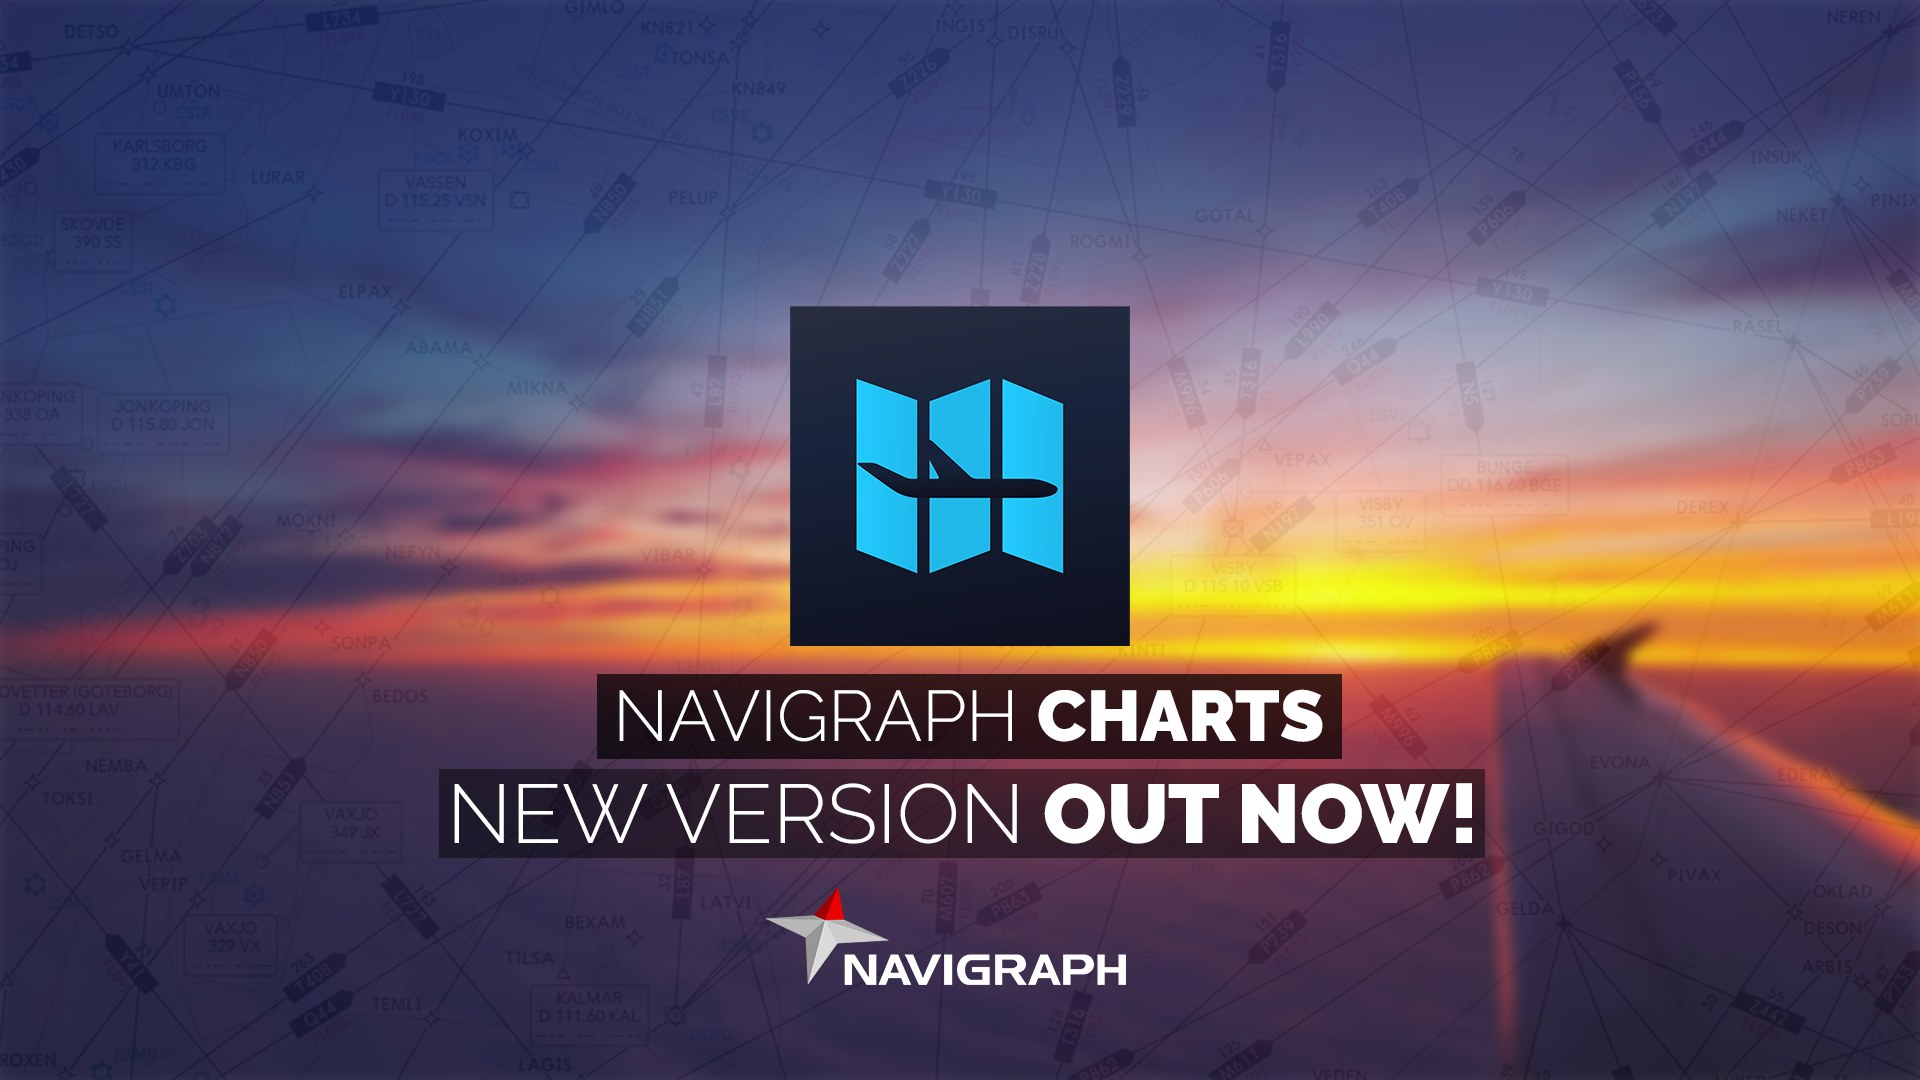 Navigraph Charts News